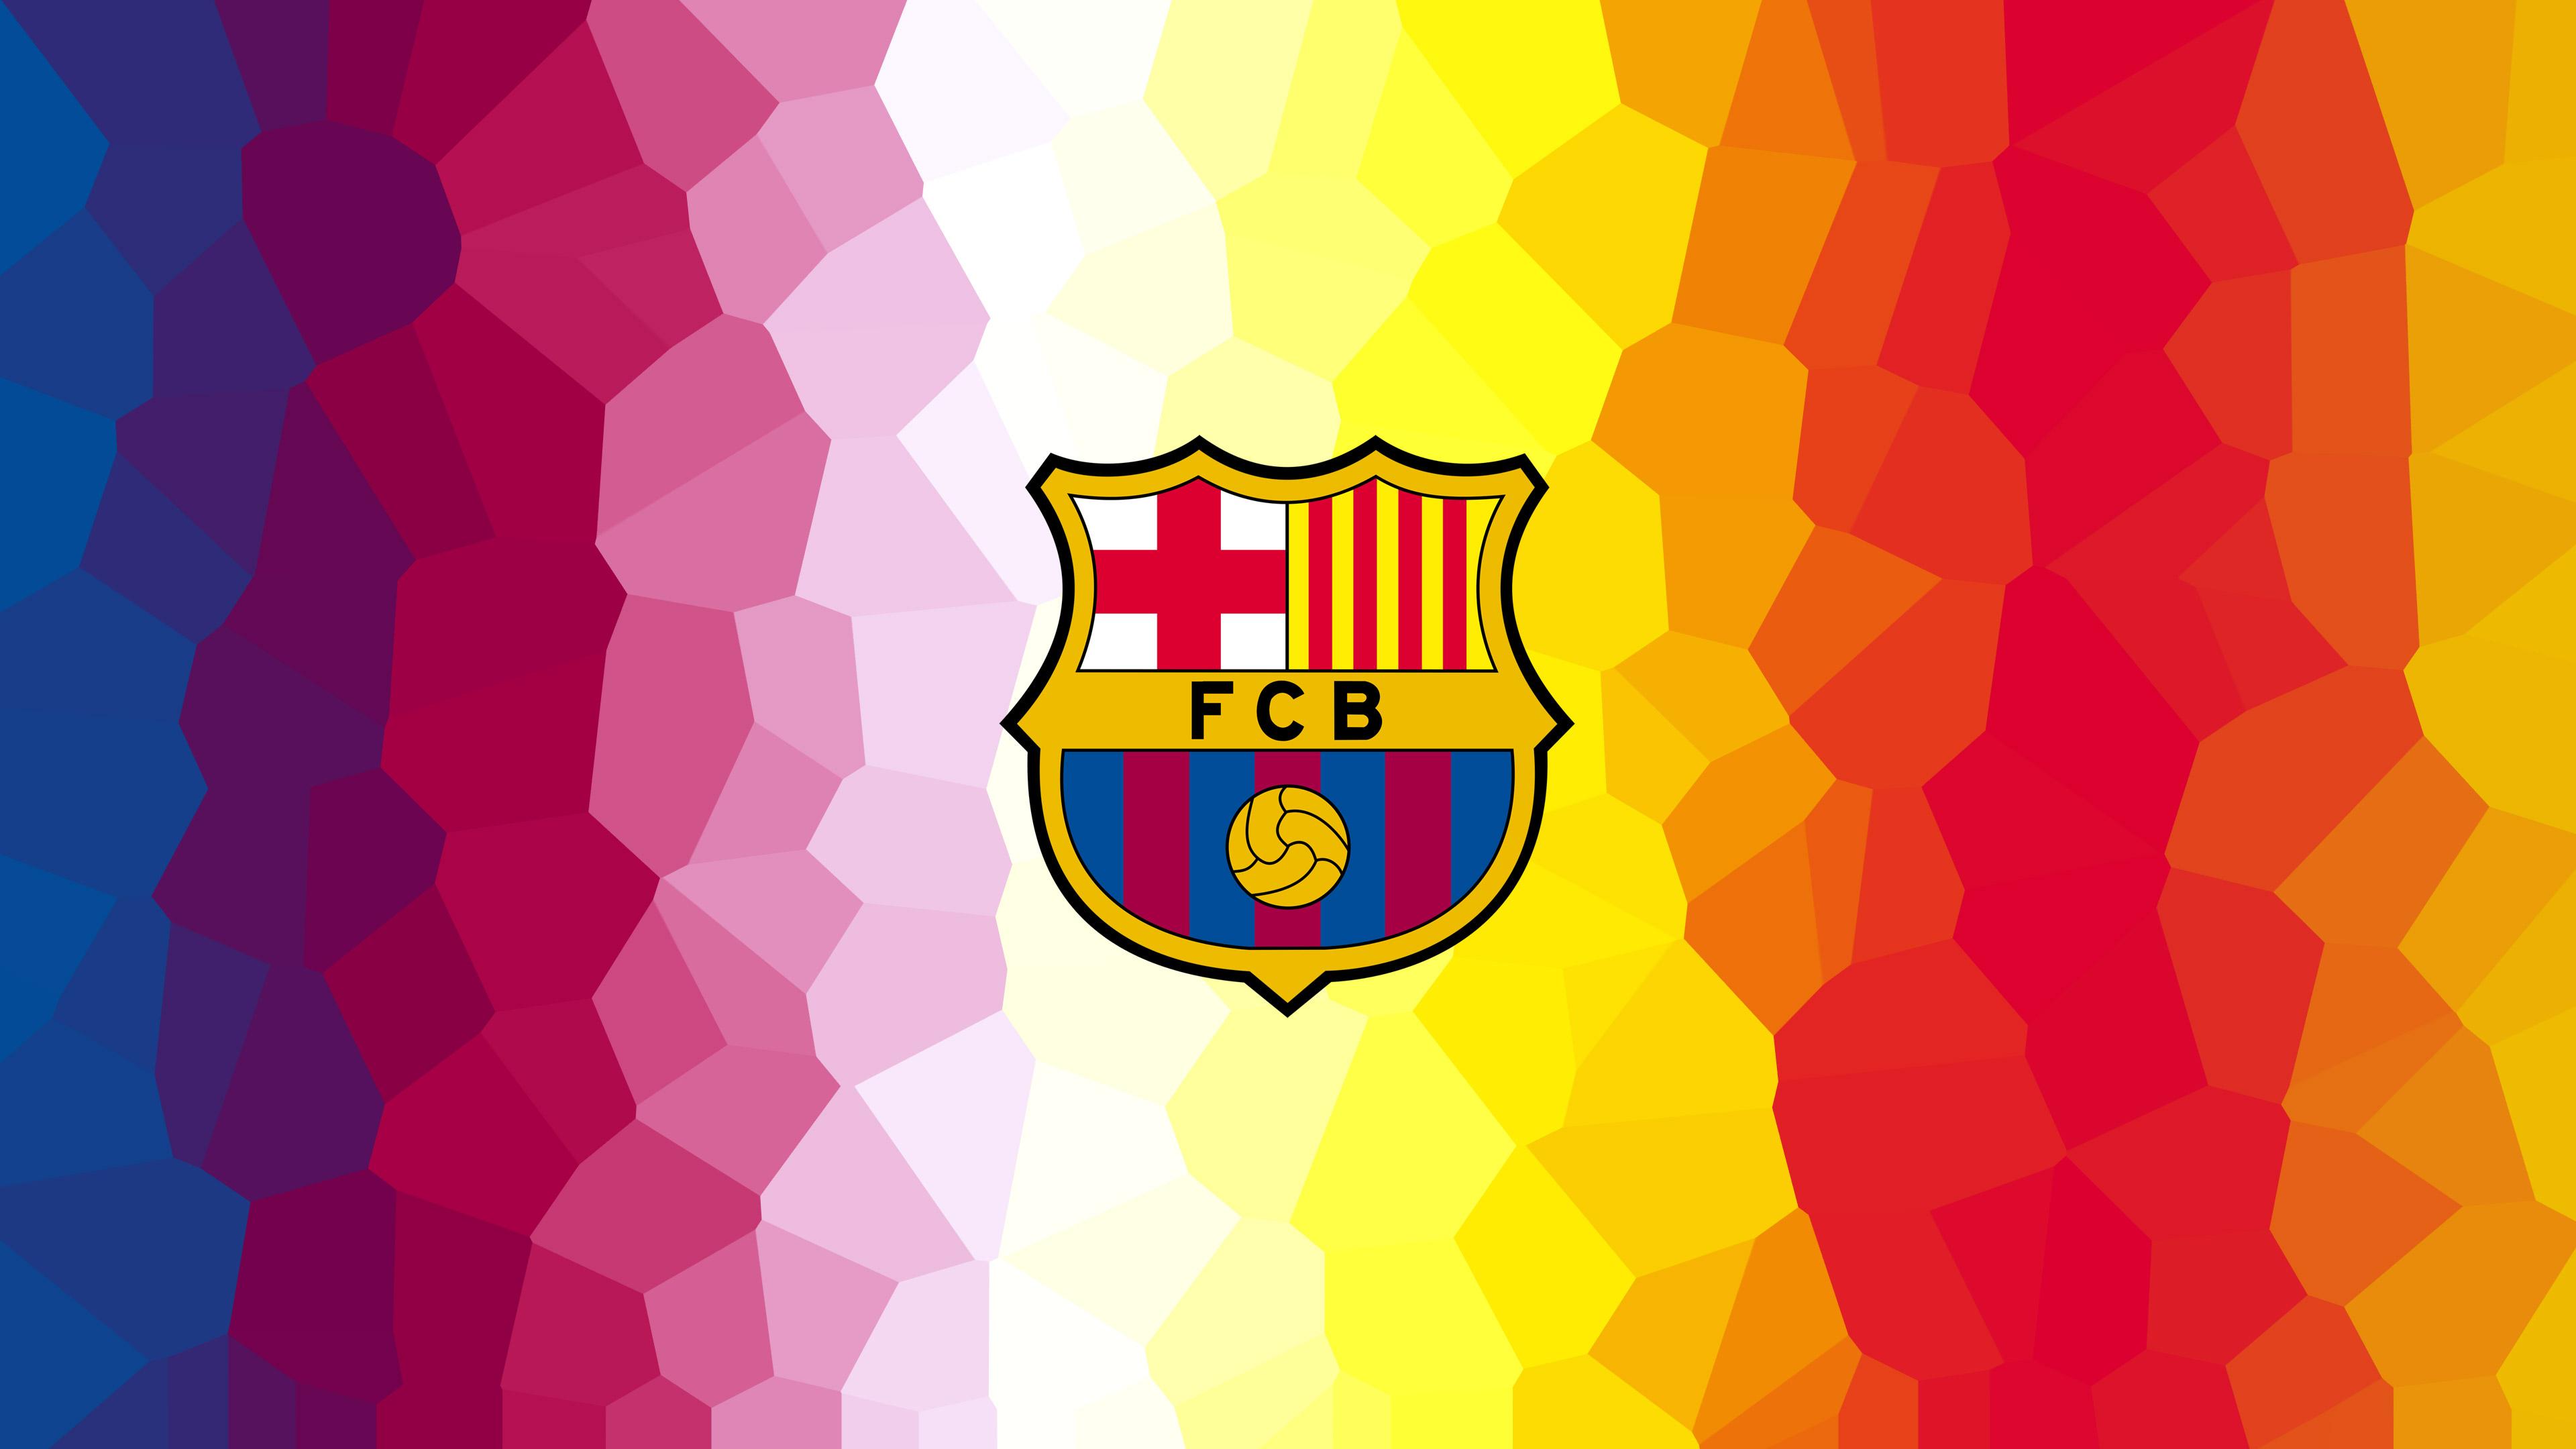 fcb logo minimalism 1538786715 - FCB Logo Minimalism - sports wallpapers, soccer wallpapers, football wallpapers, fcb wallpapers, fc barcelona wallpapers, fc barcelona team wallpapers